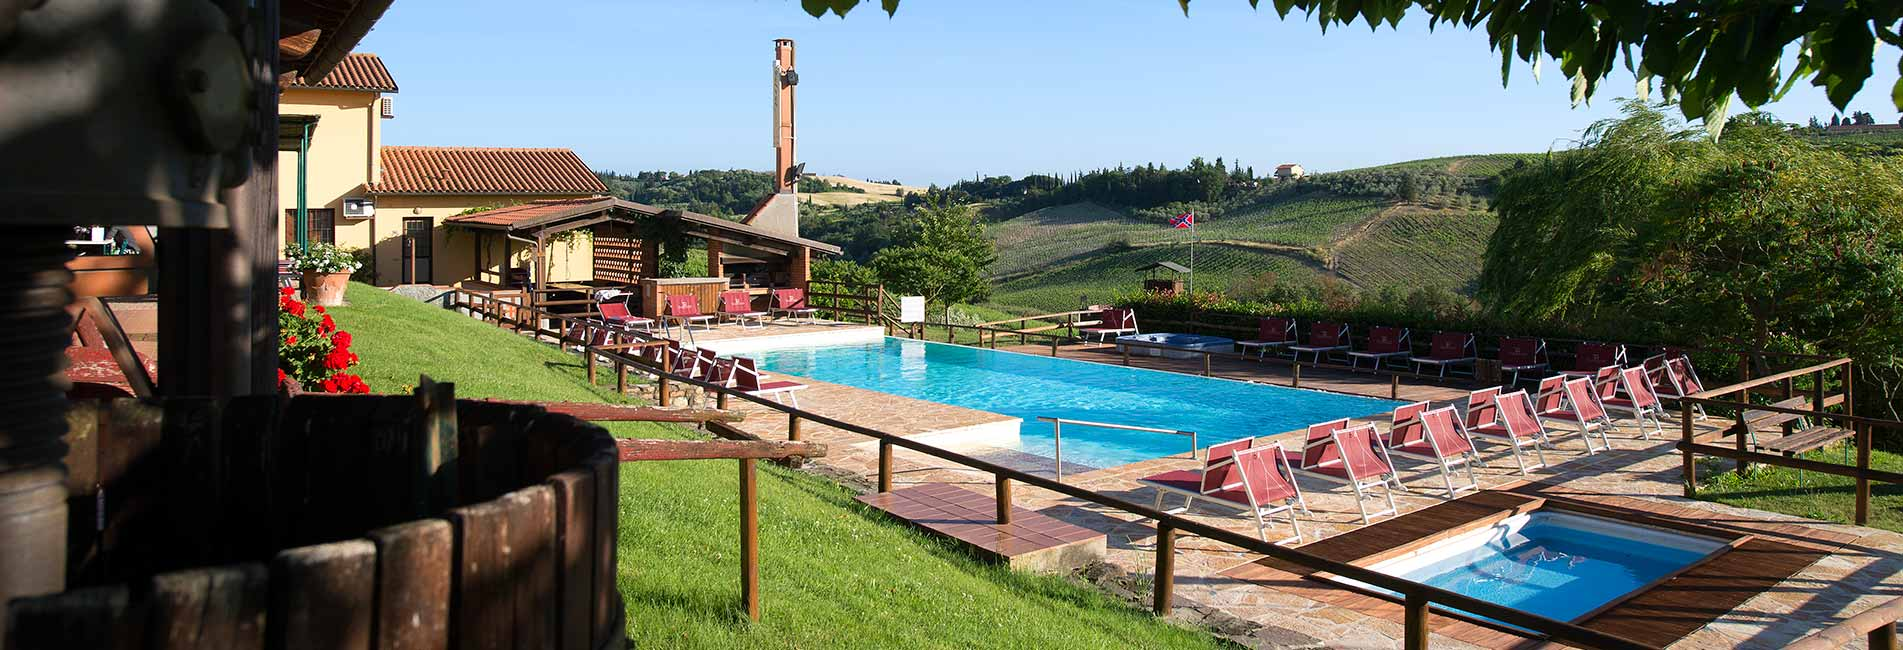 borgo_filicardo_apartments_chianti_tuscany1